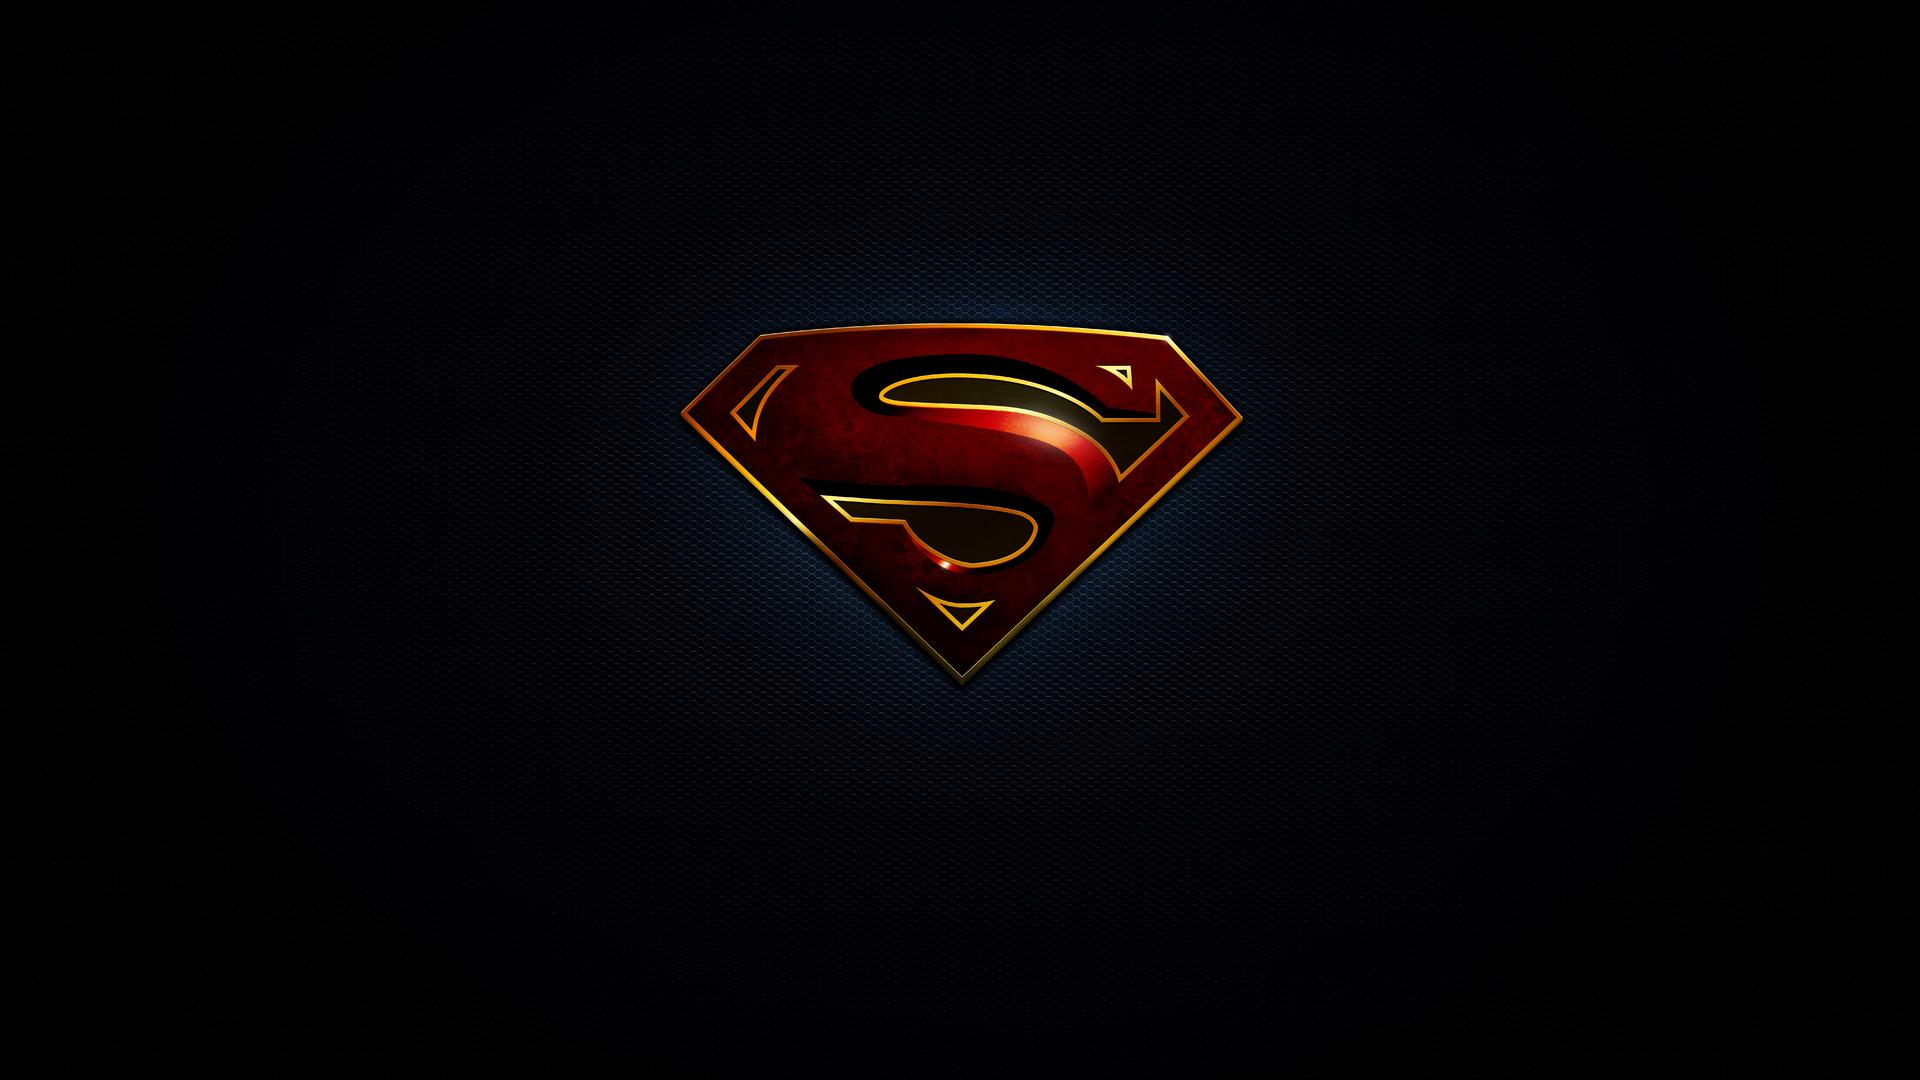 1920x1080 superman logo 10k laptop full hd 1080p hd 4k wallpapers superman logo 10k vxg voltagebd Gallery